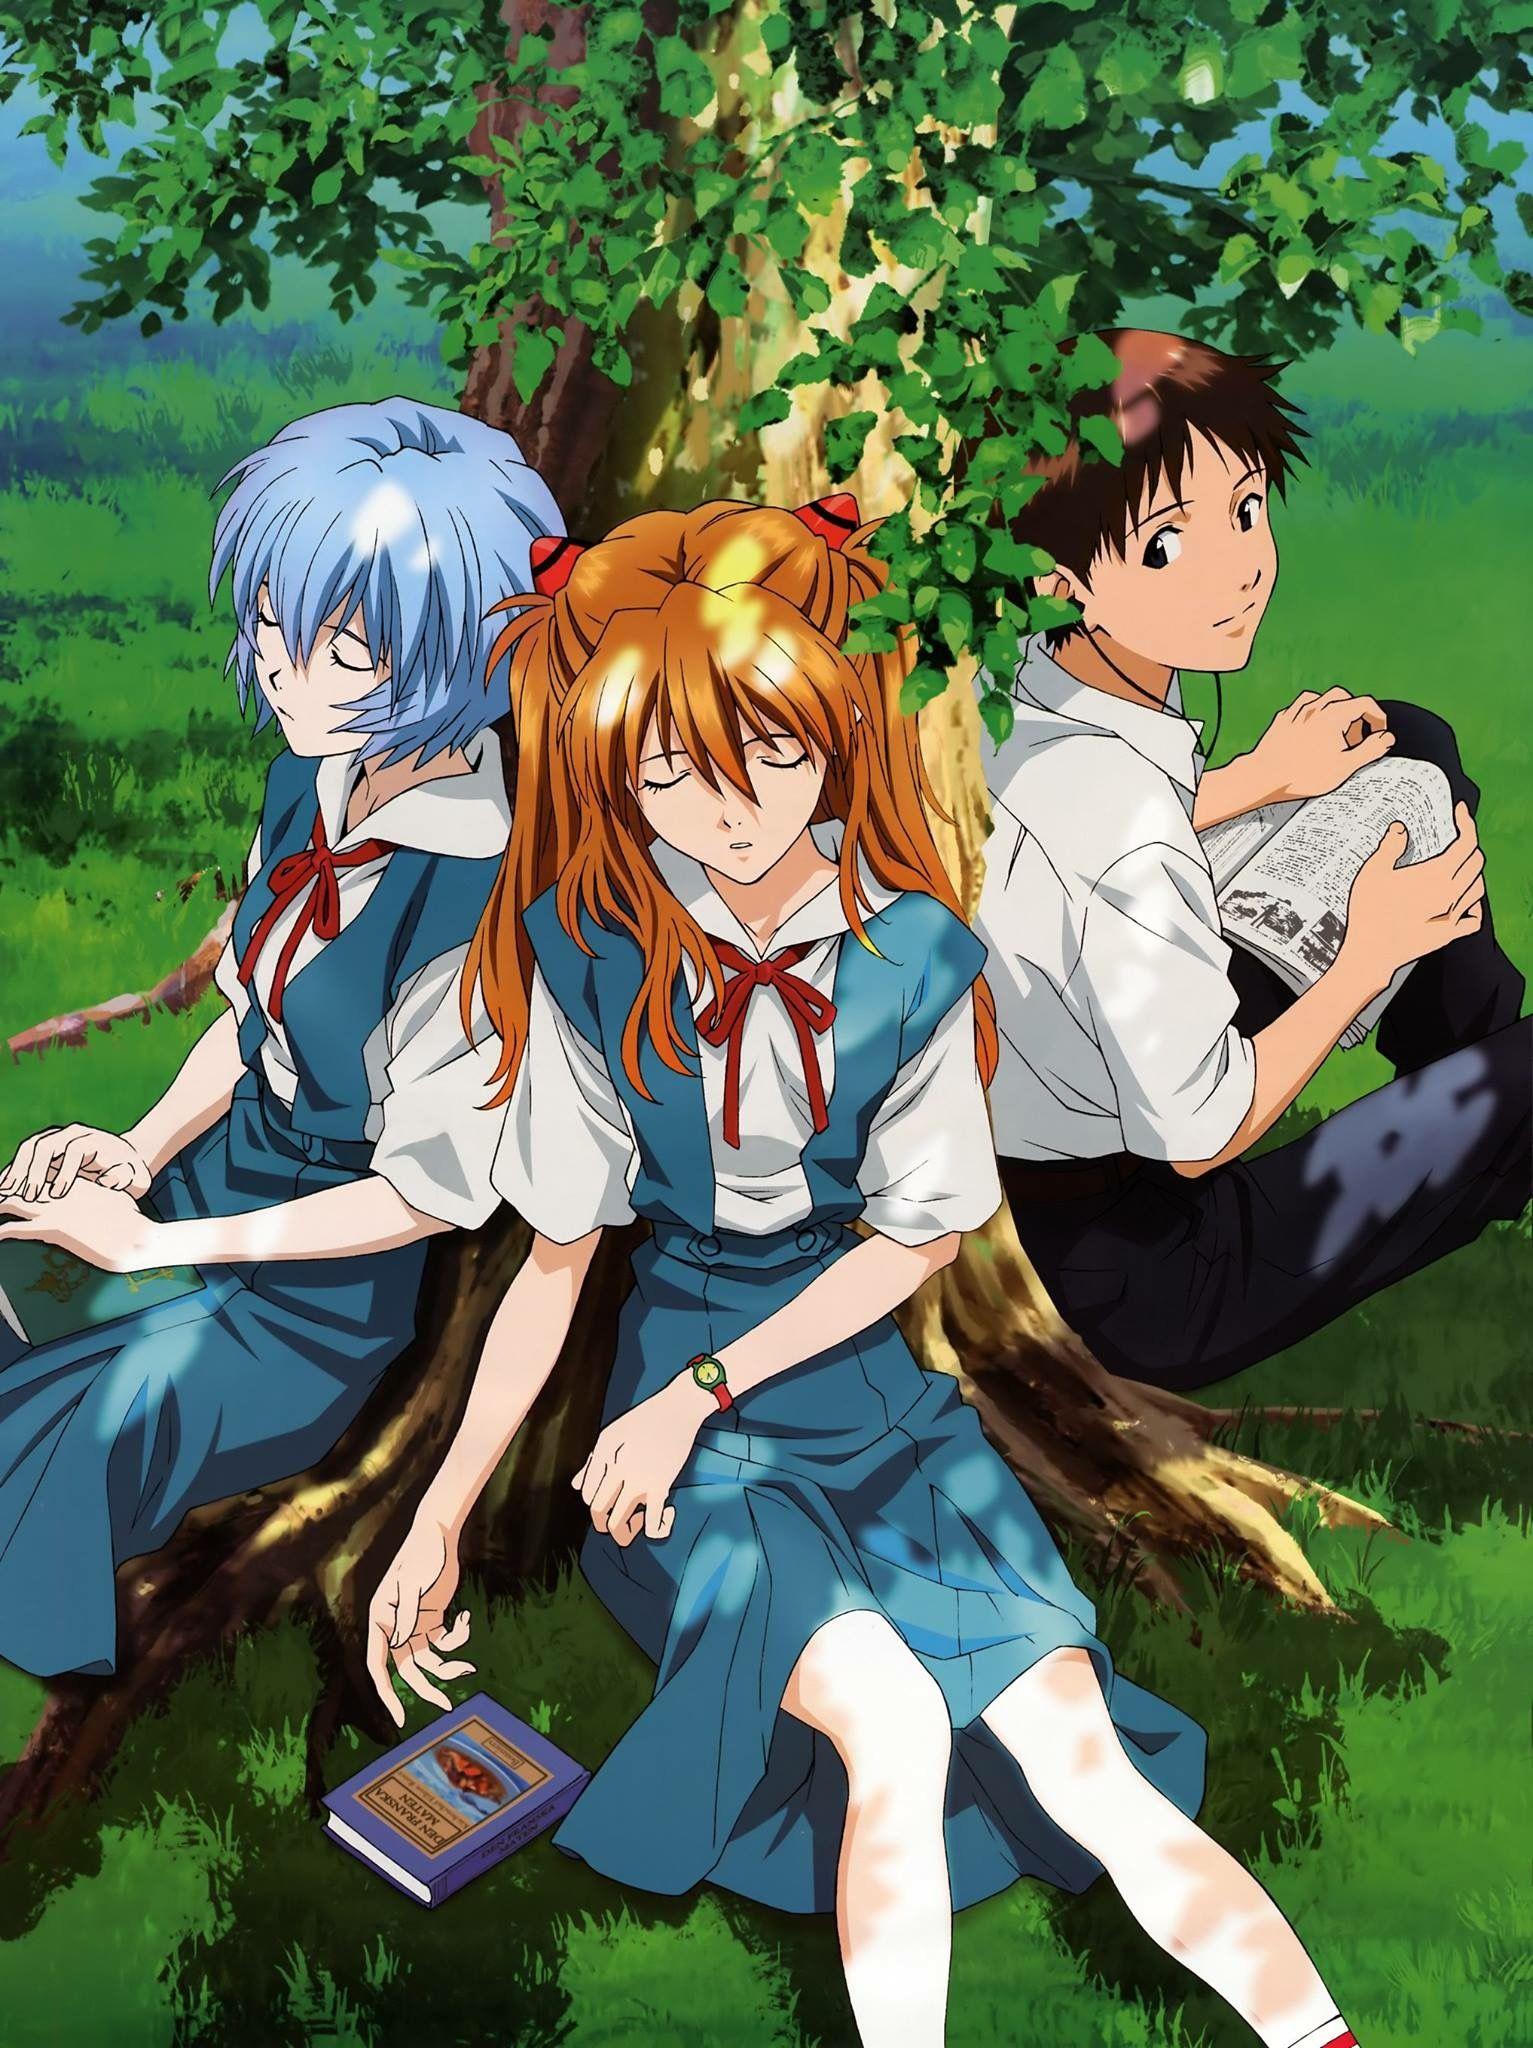 anime おしゃれまとめの人気アイデア pinterest anime idiot エヴァンゲリオン 新世紀エヴァンゲリオン エヴァンゲリオン イラスト